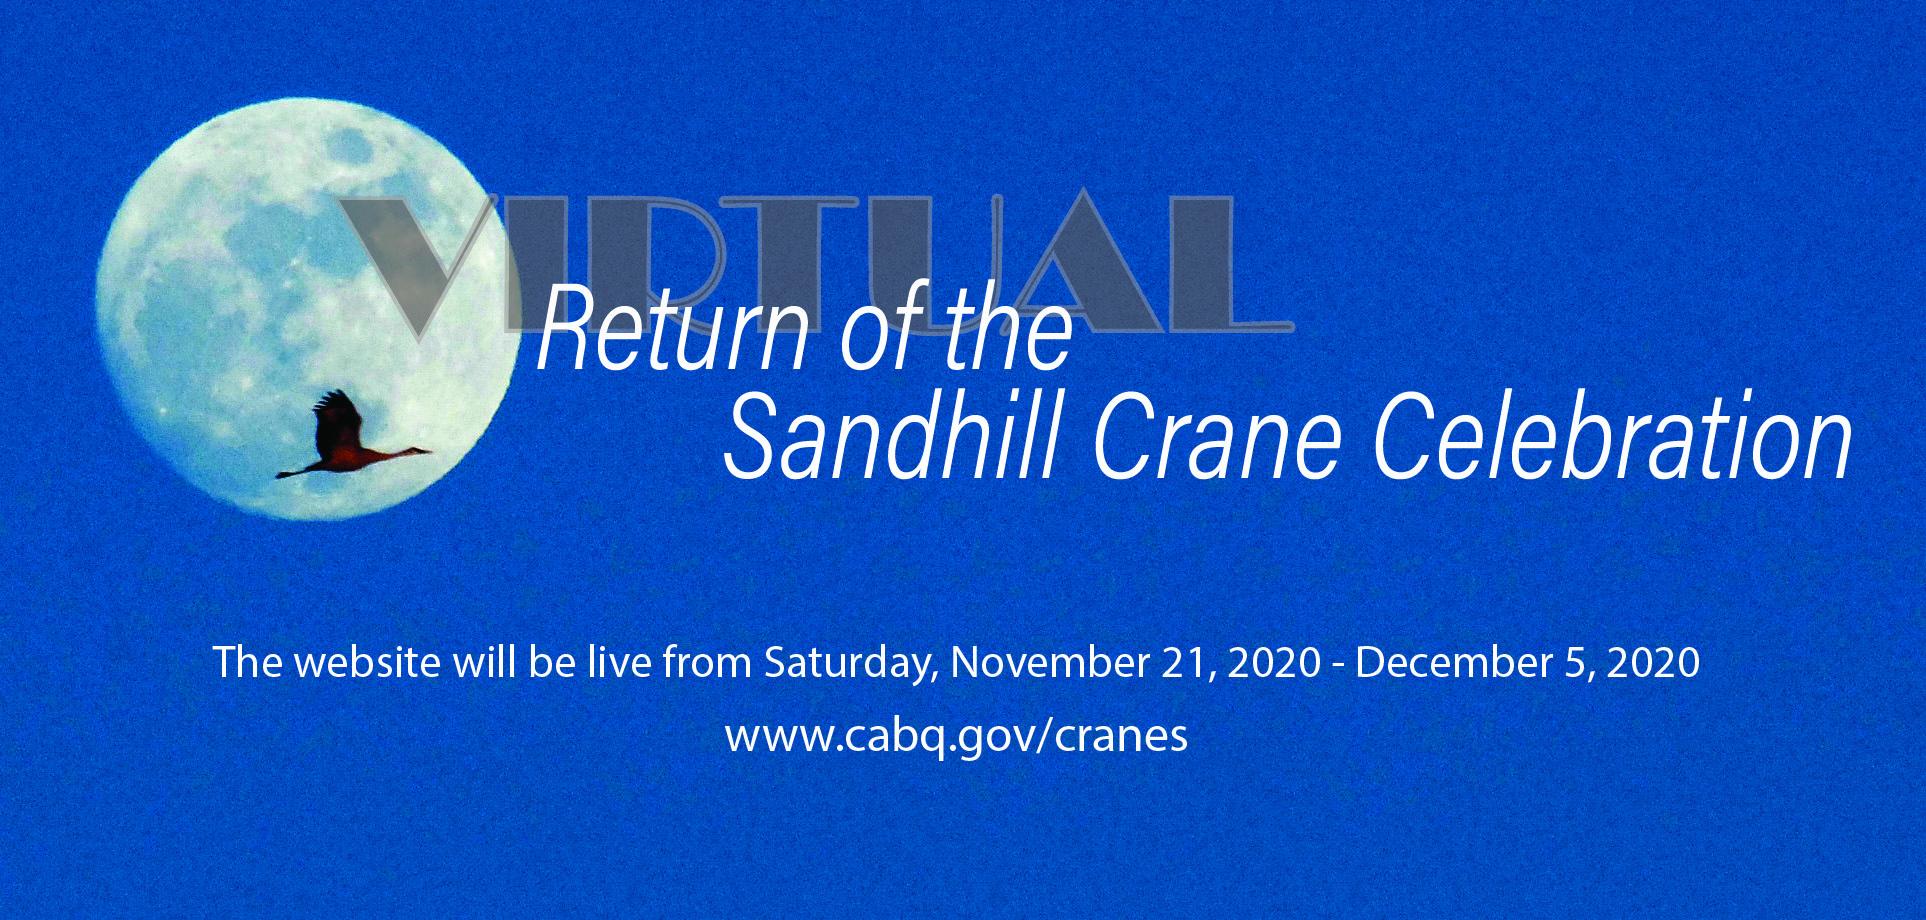 Return of the Sandhill Crane Celebration